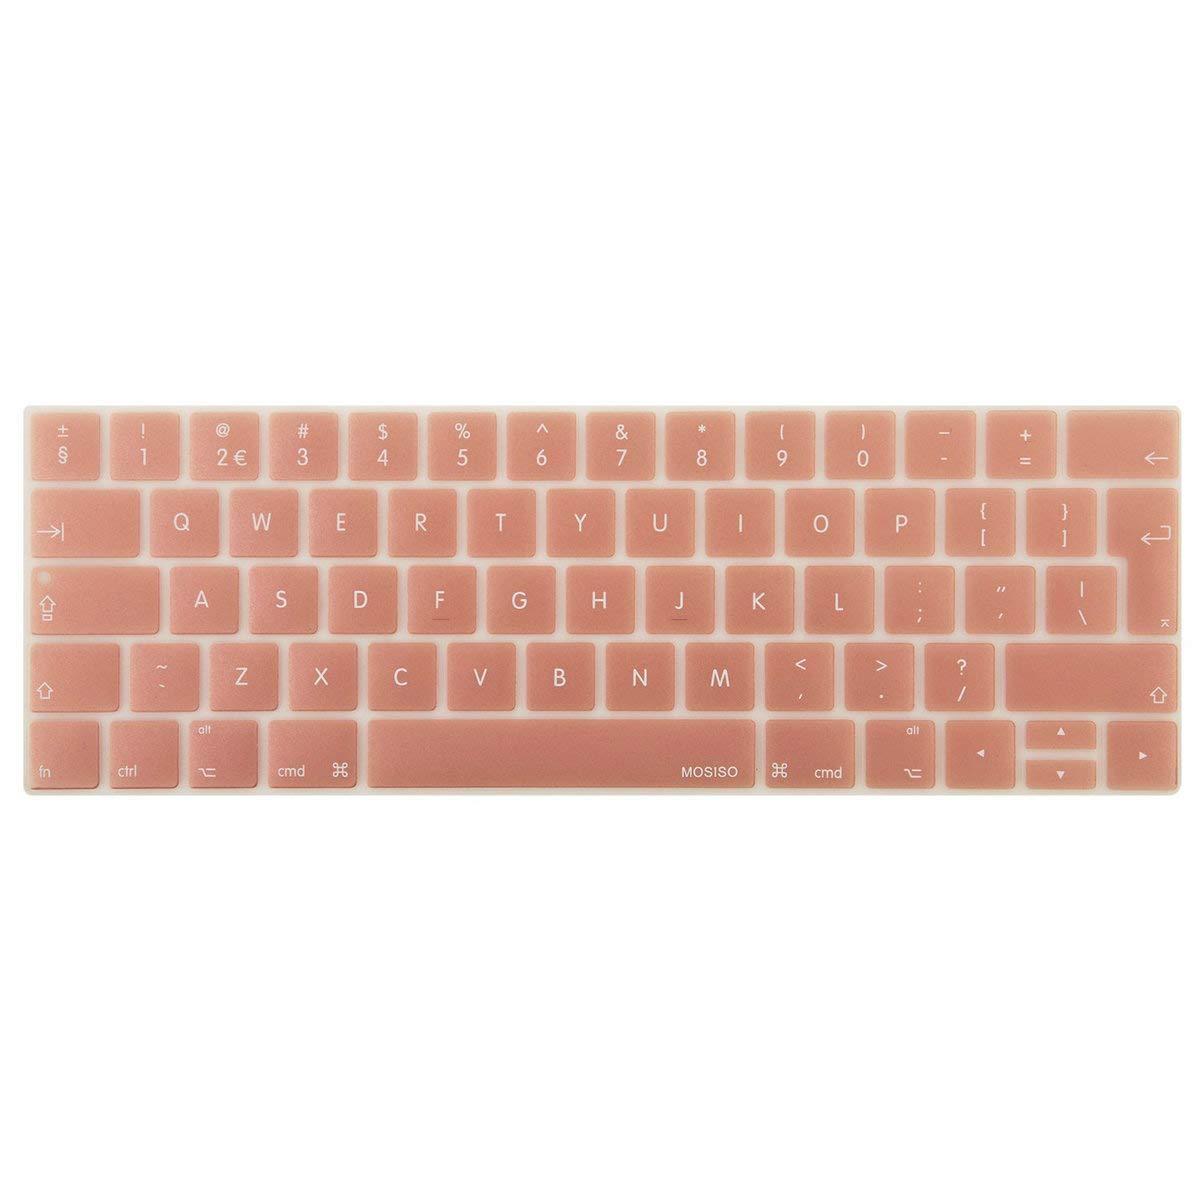 MOSISO Protection Clavier MacBook Pro Touch Bar 13' 15' A1989/A1706 et A1990/A1707 2018/2017/2016 Libé ration, Keyboard Cover(Disposition EU), Clavier QWERTY, Noir EU-KC-NEW-MBP15-Black